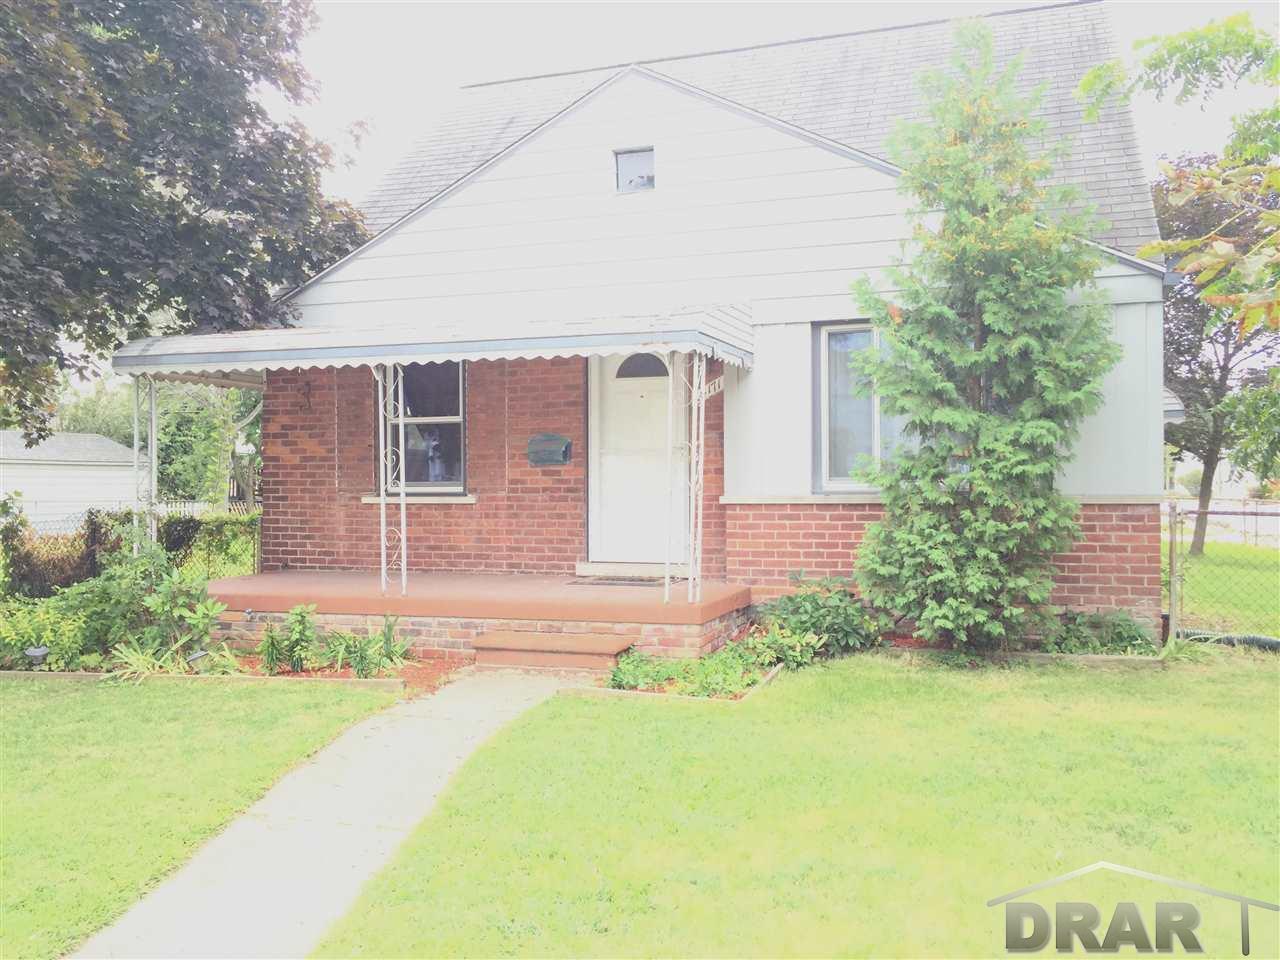 Real Estate for Sale, ListingId: 34498934, Dearborn,MI48124